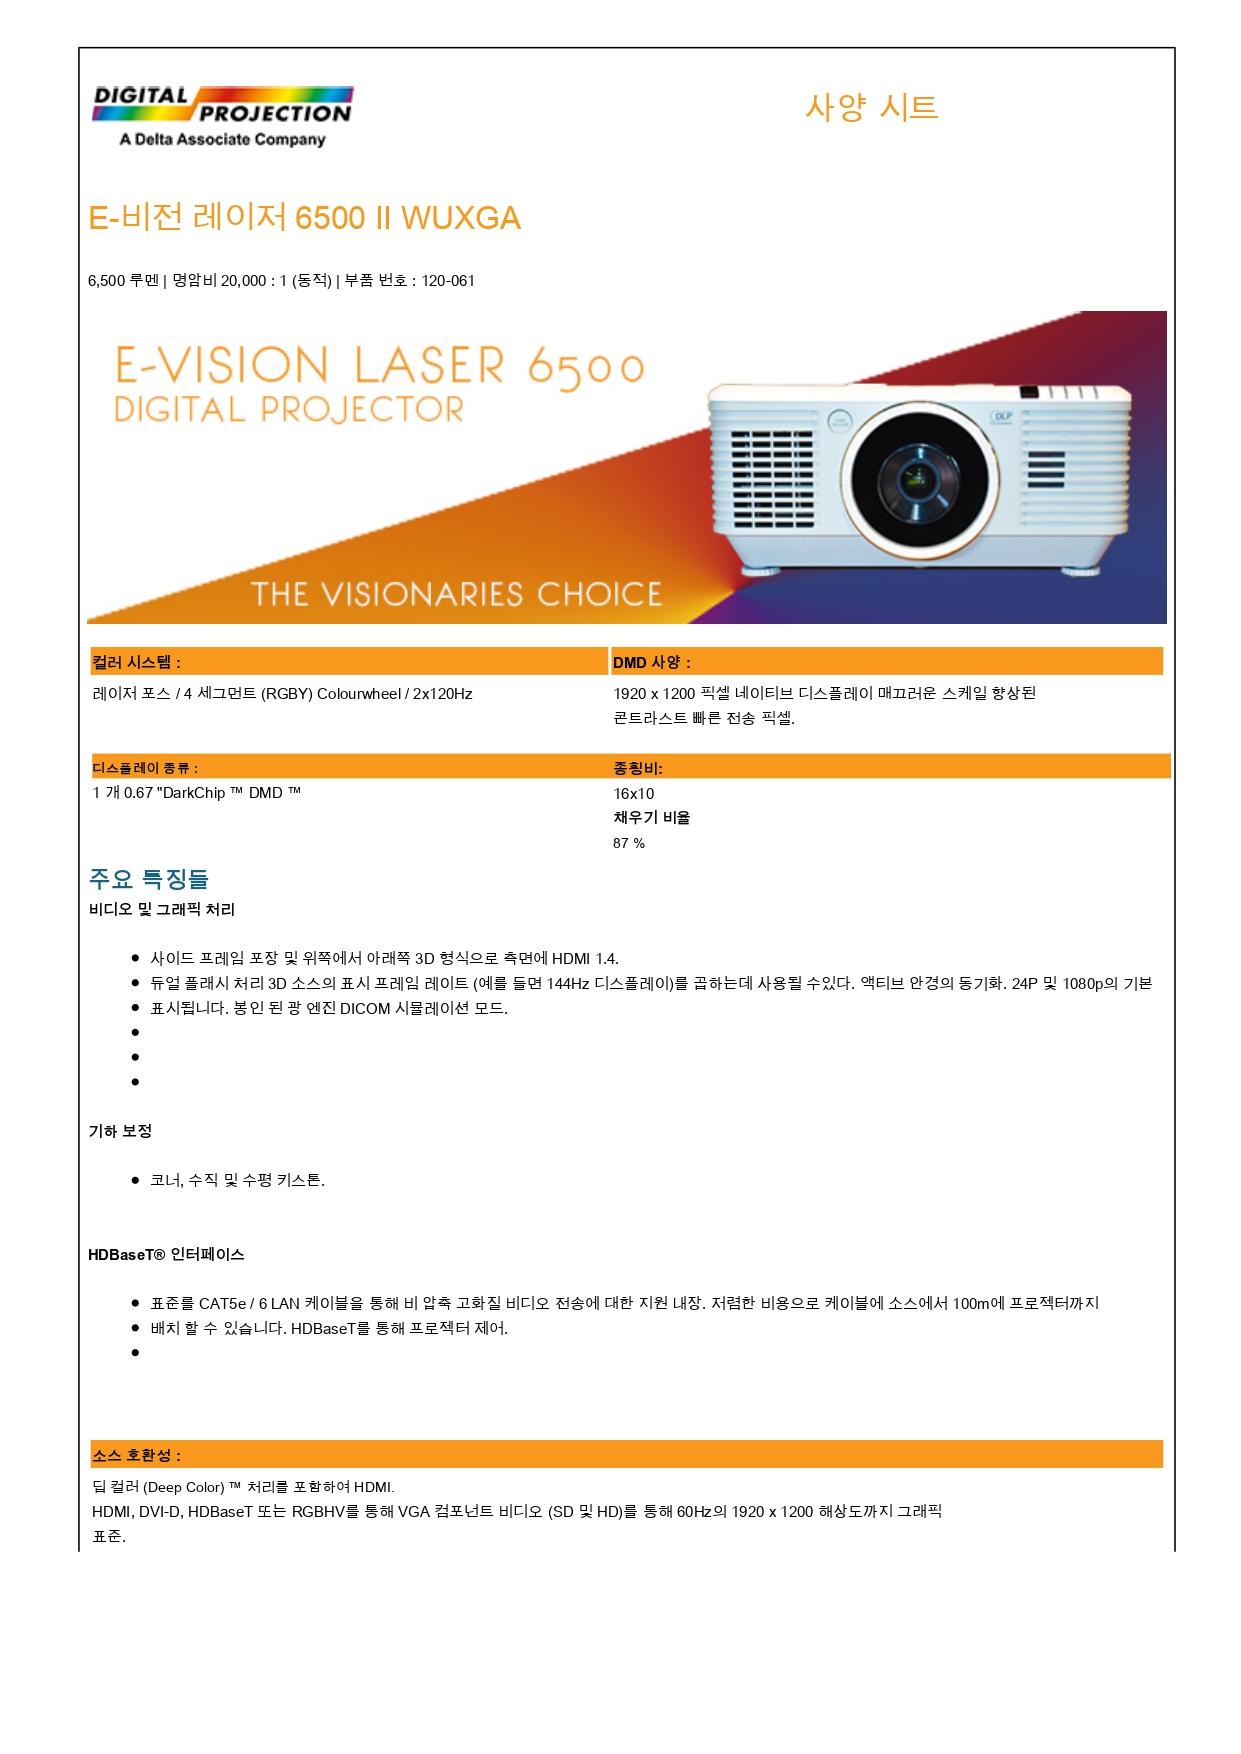 digitalprojection-120-061.en.ko_page-0001.jpg